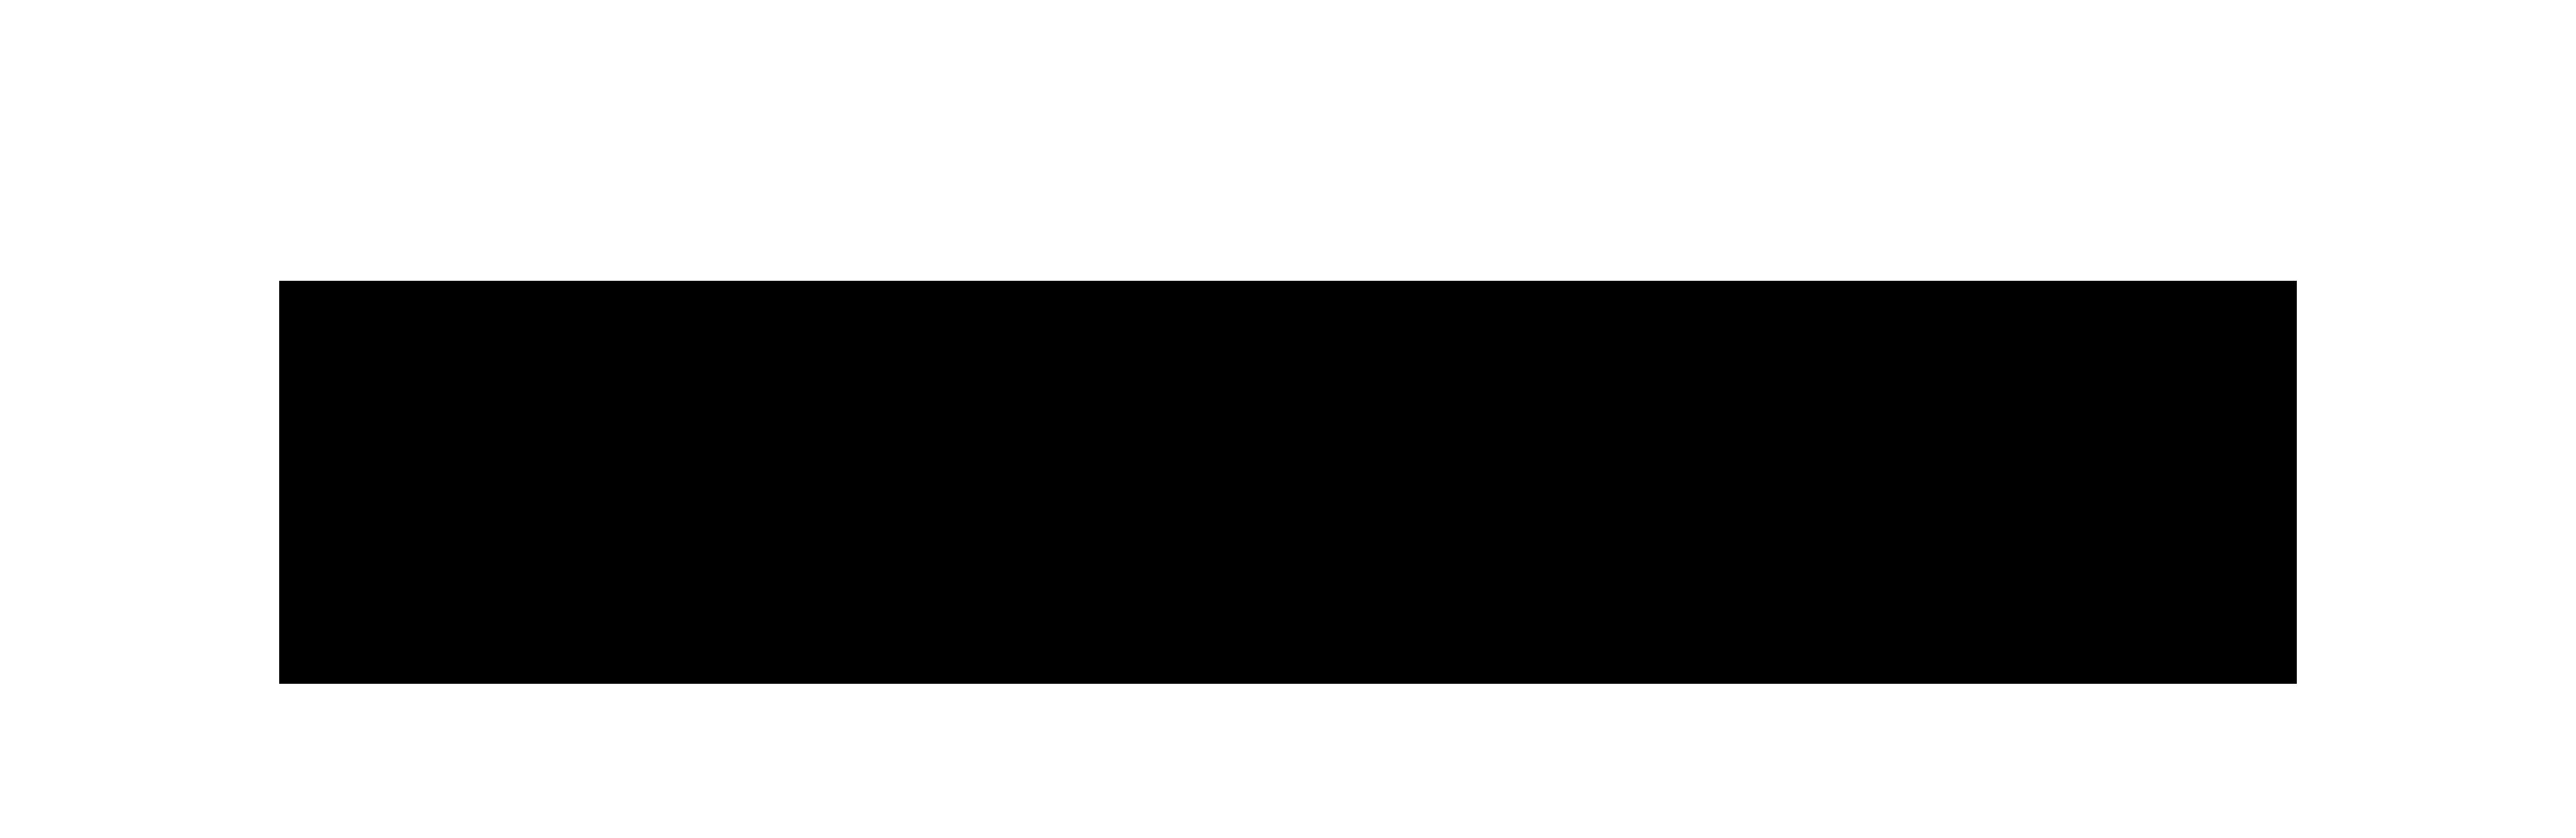 FLTR_horizontal_logo_regular_black-01